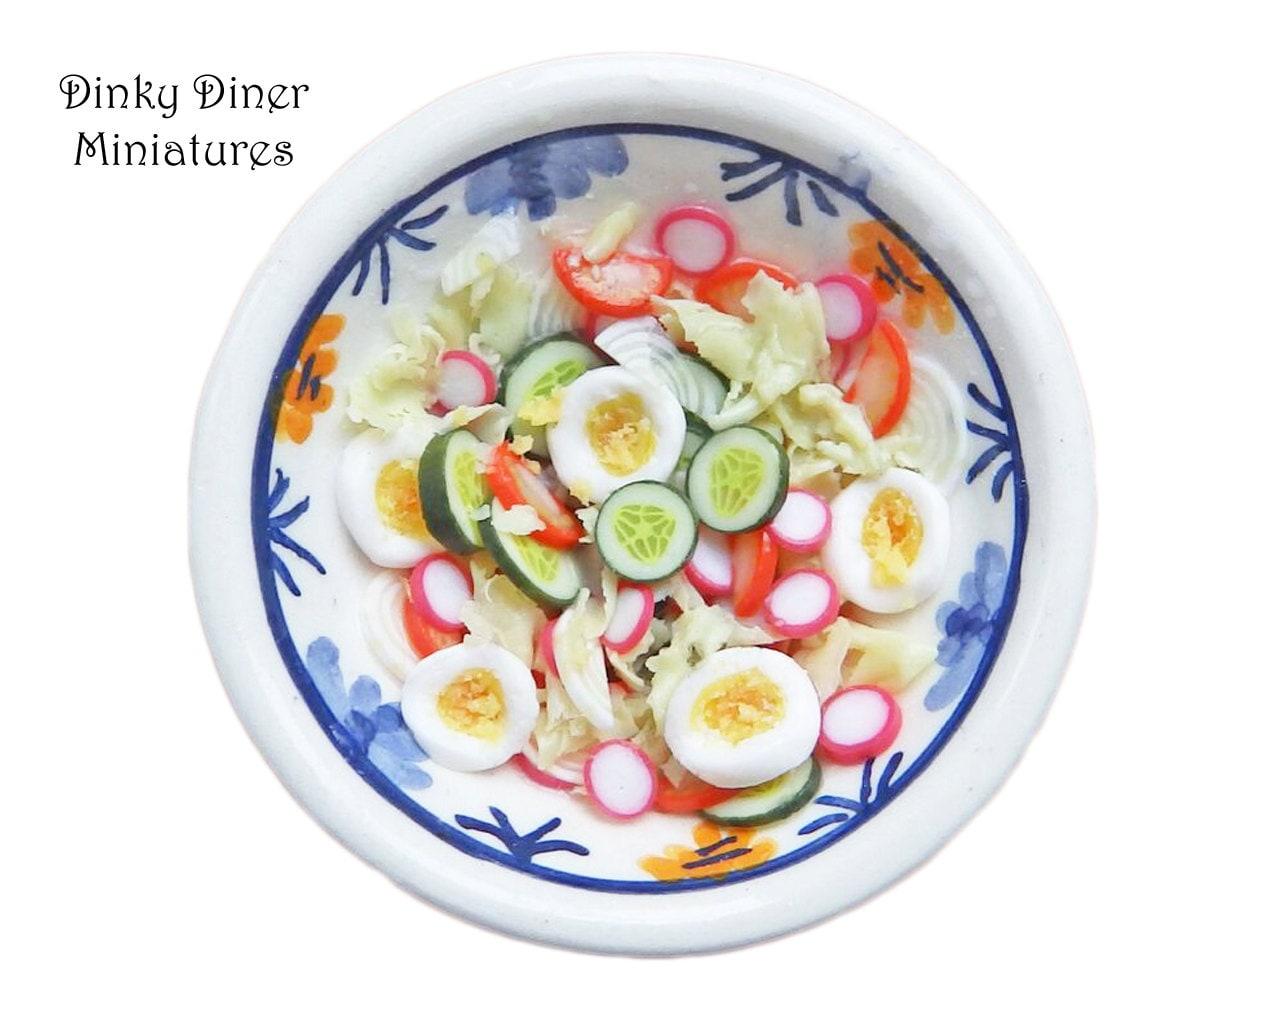 Bowl of Egg Salad (Summer Picnic 2016 range)  Miniature 112 Scale Food